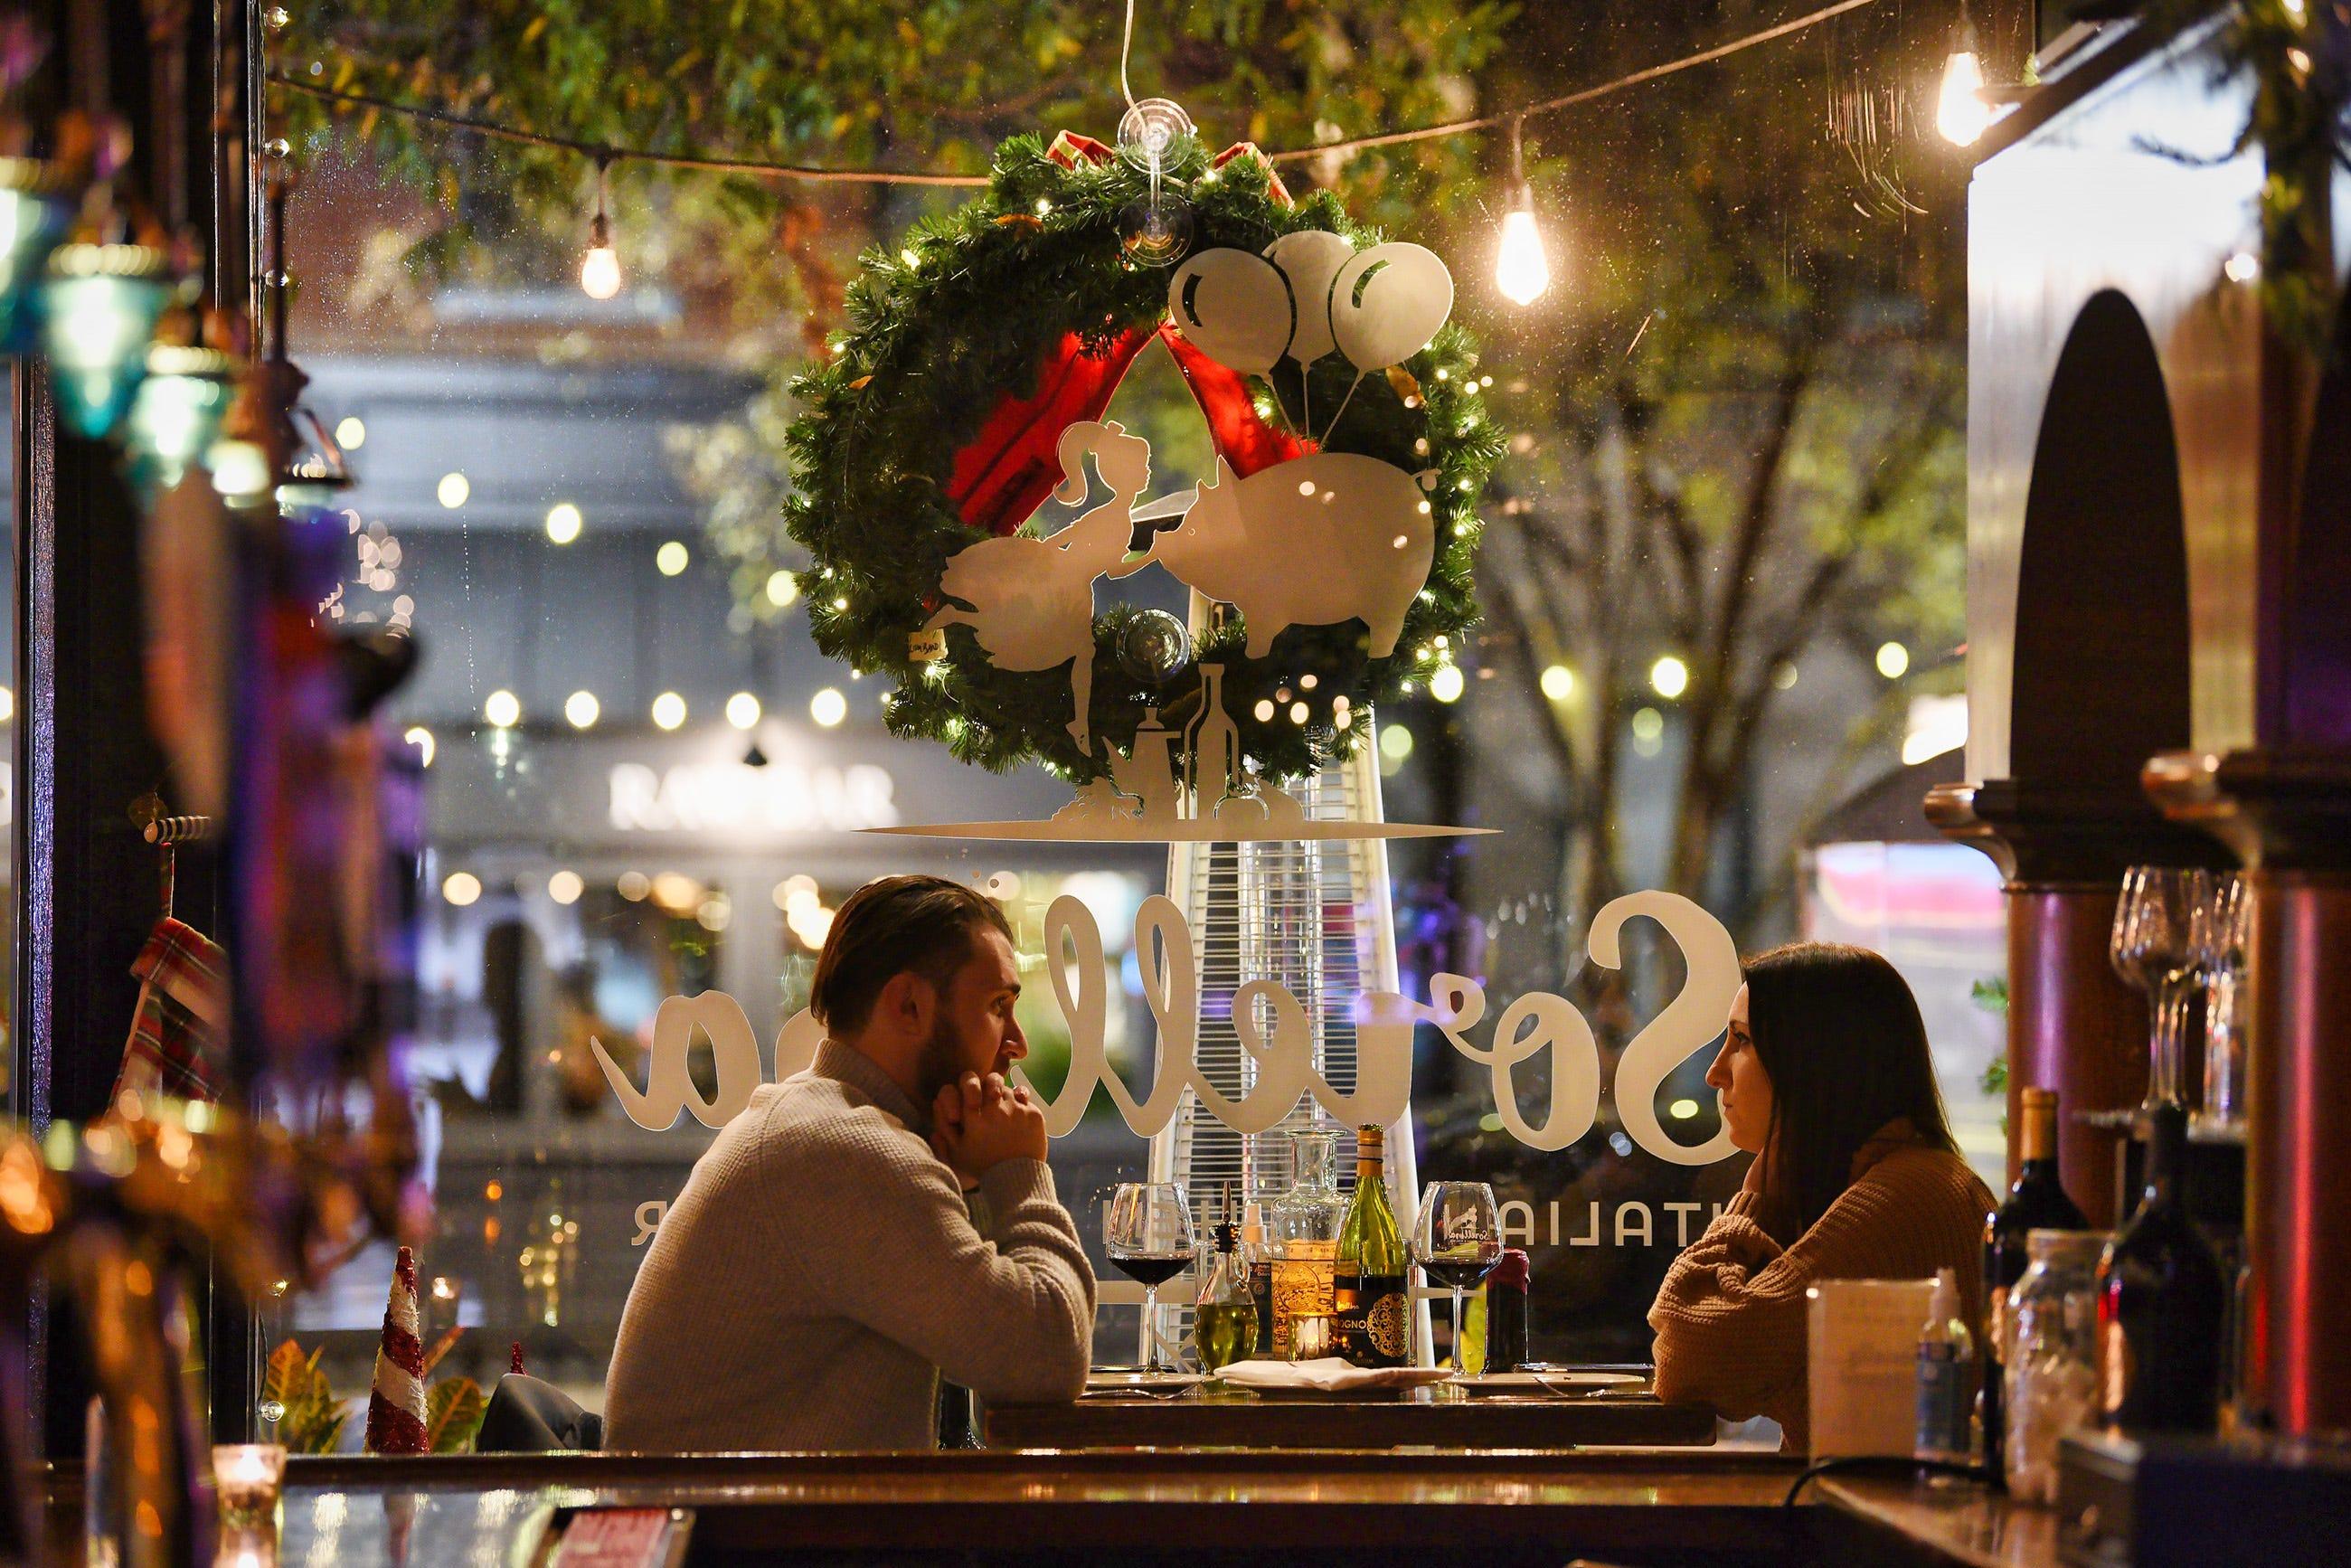 Nj Restaurants With Stunning Holiday Decorations